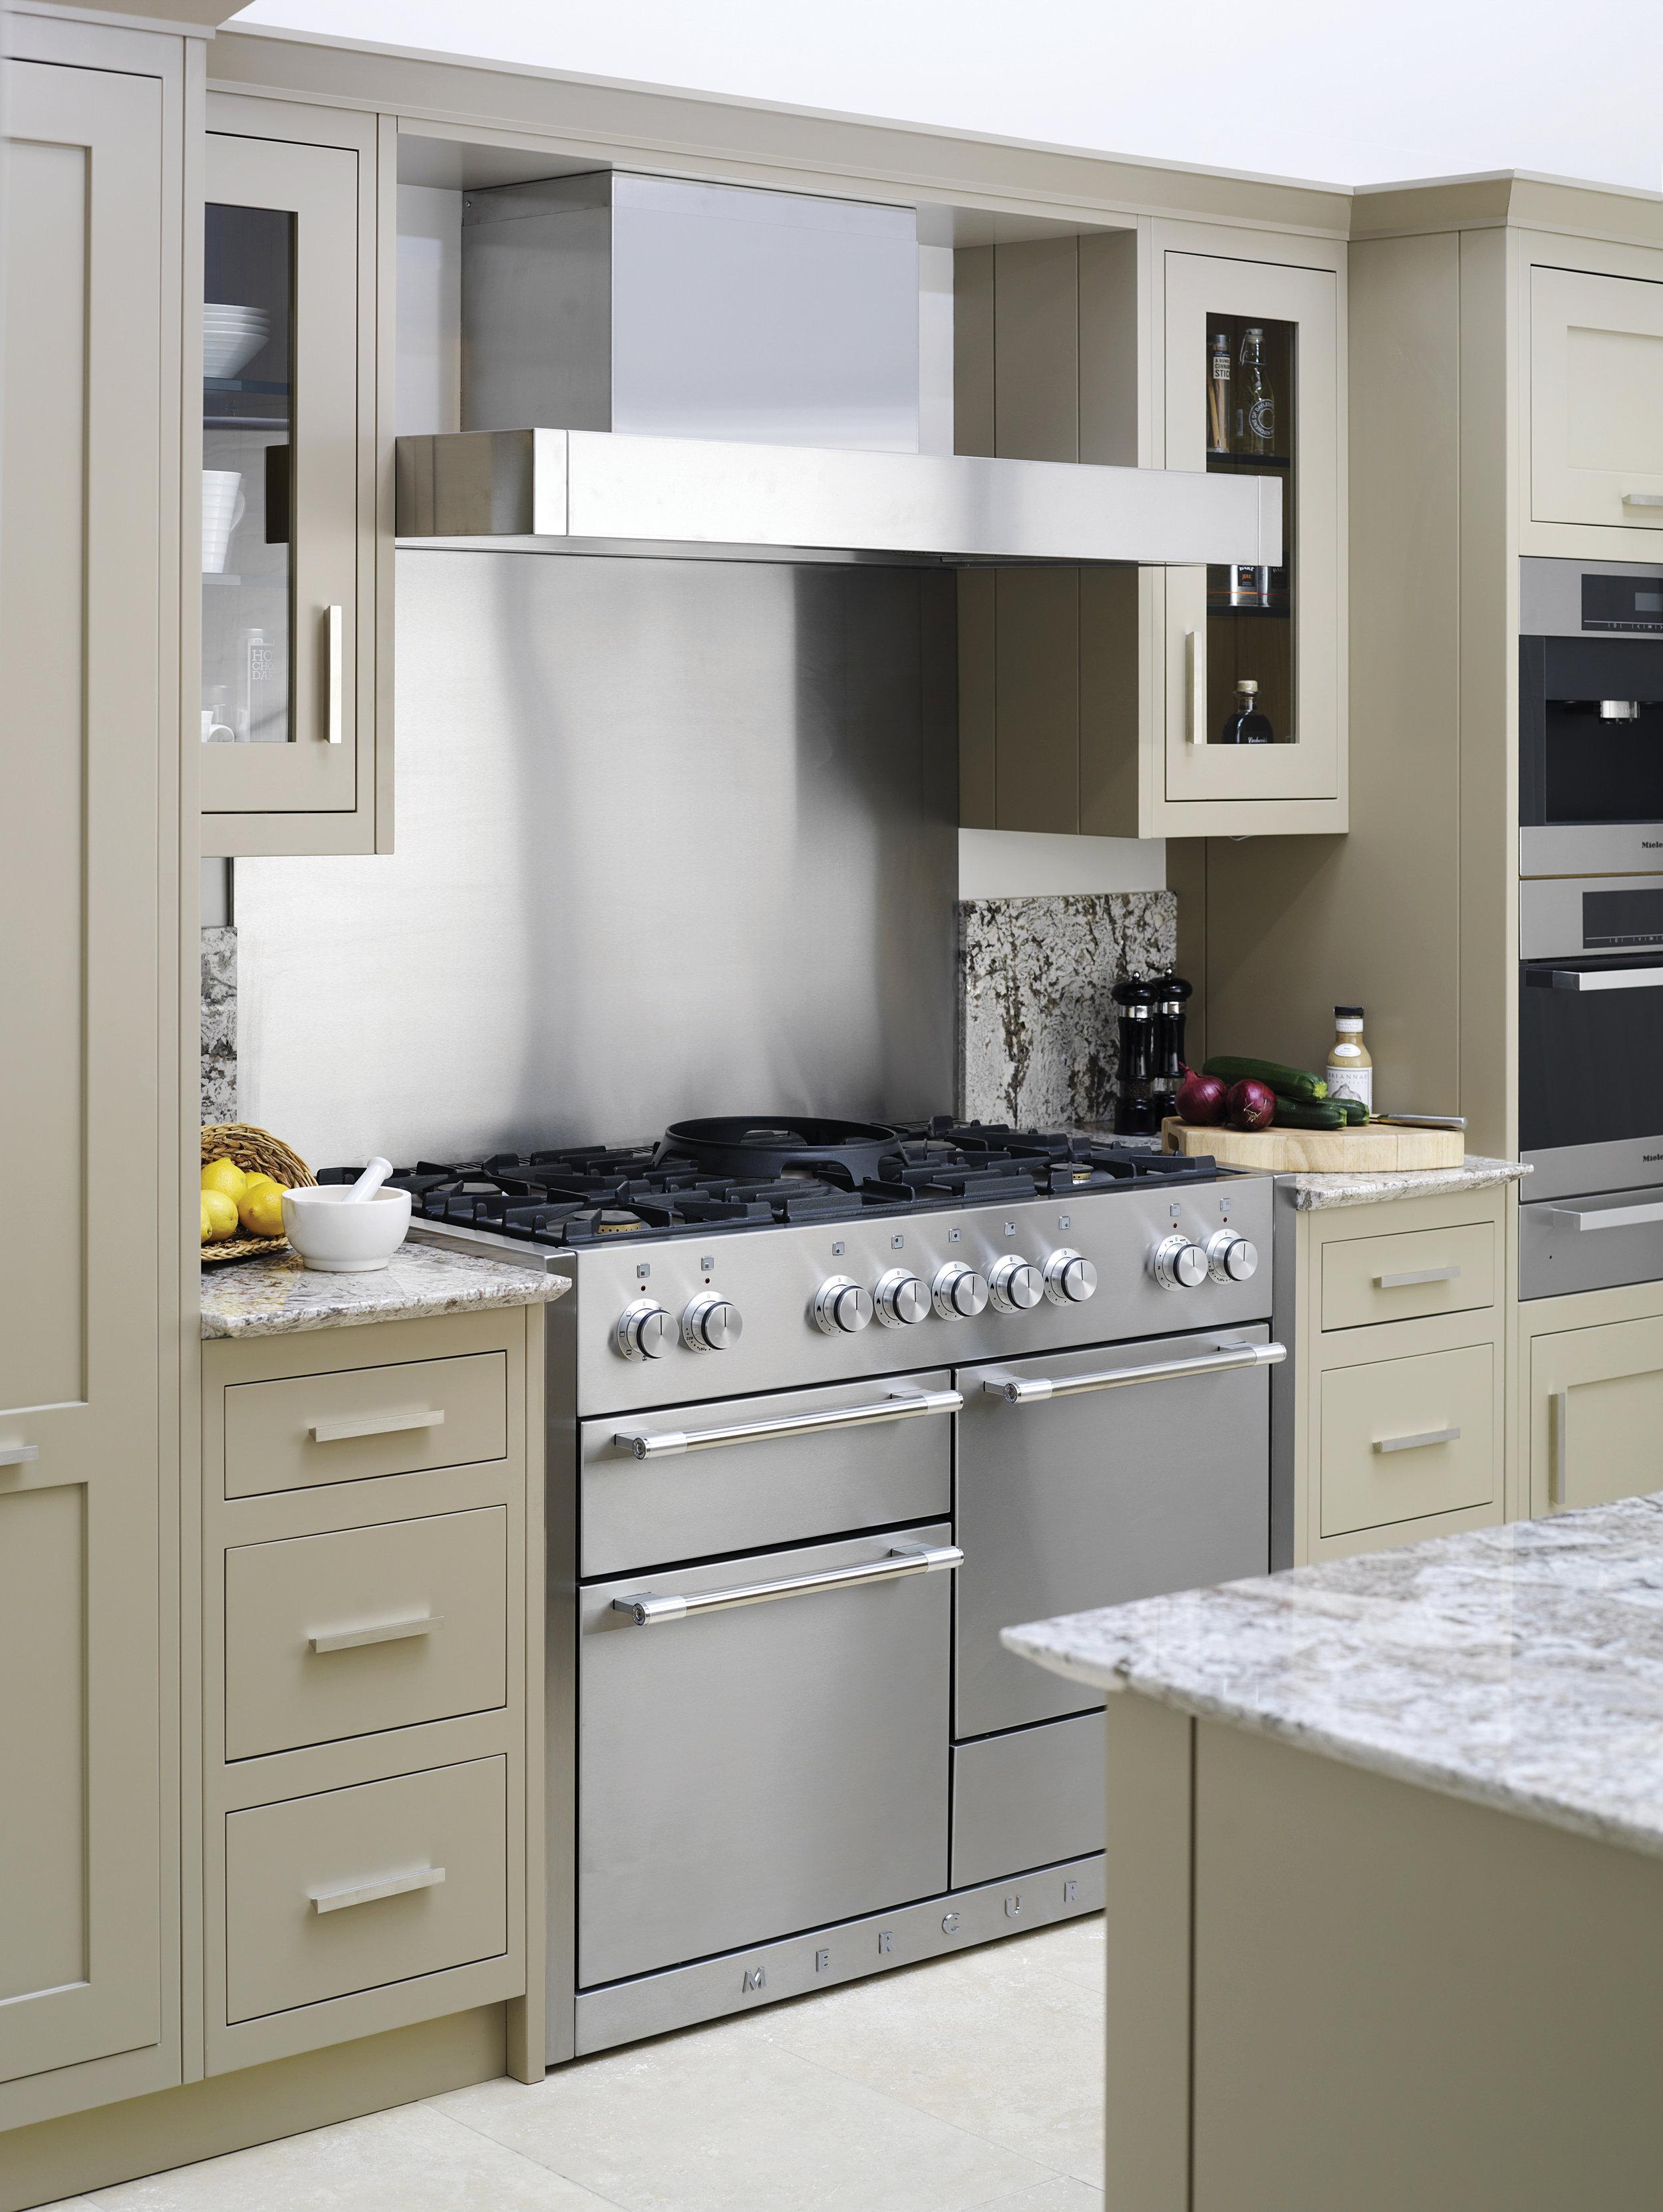 mercury mod kitchen.jpg